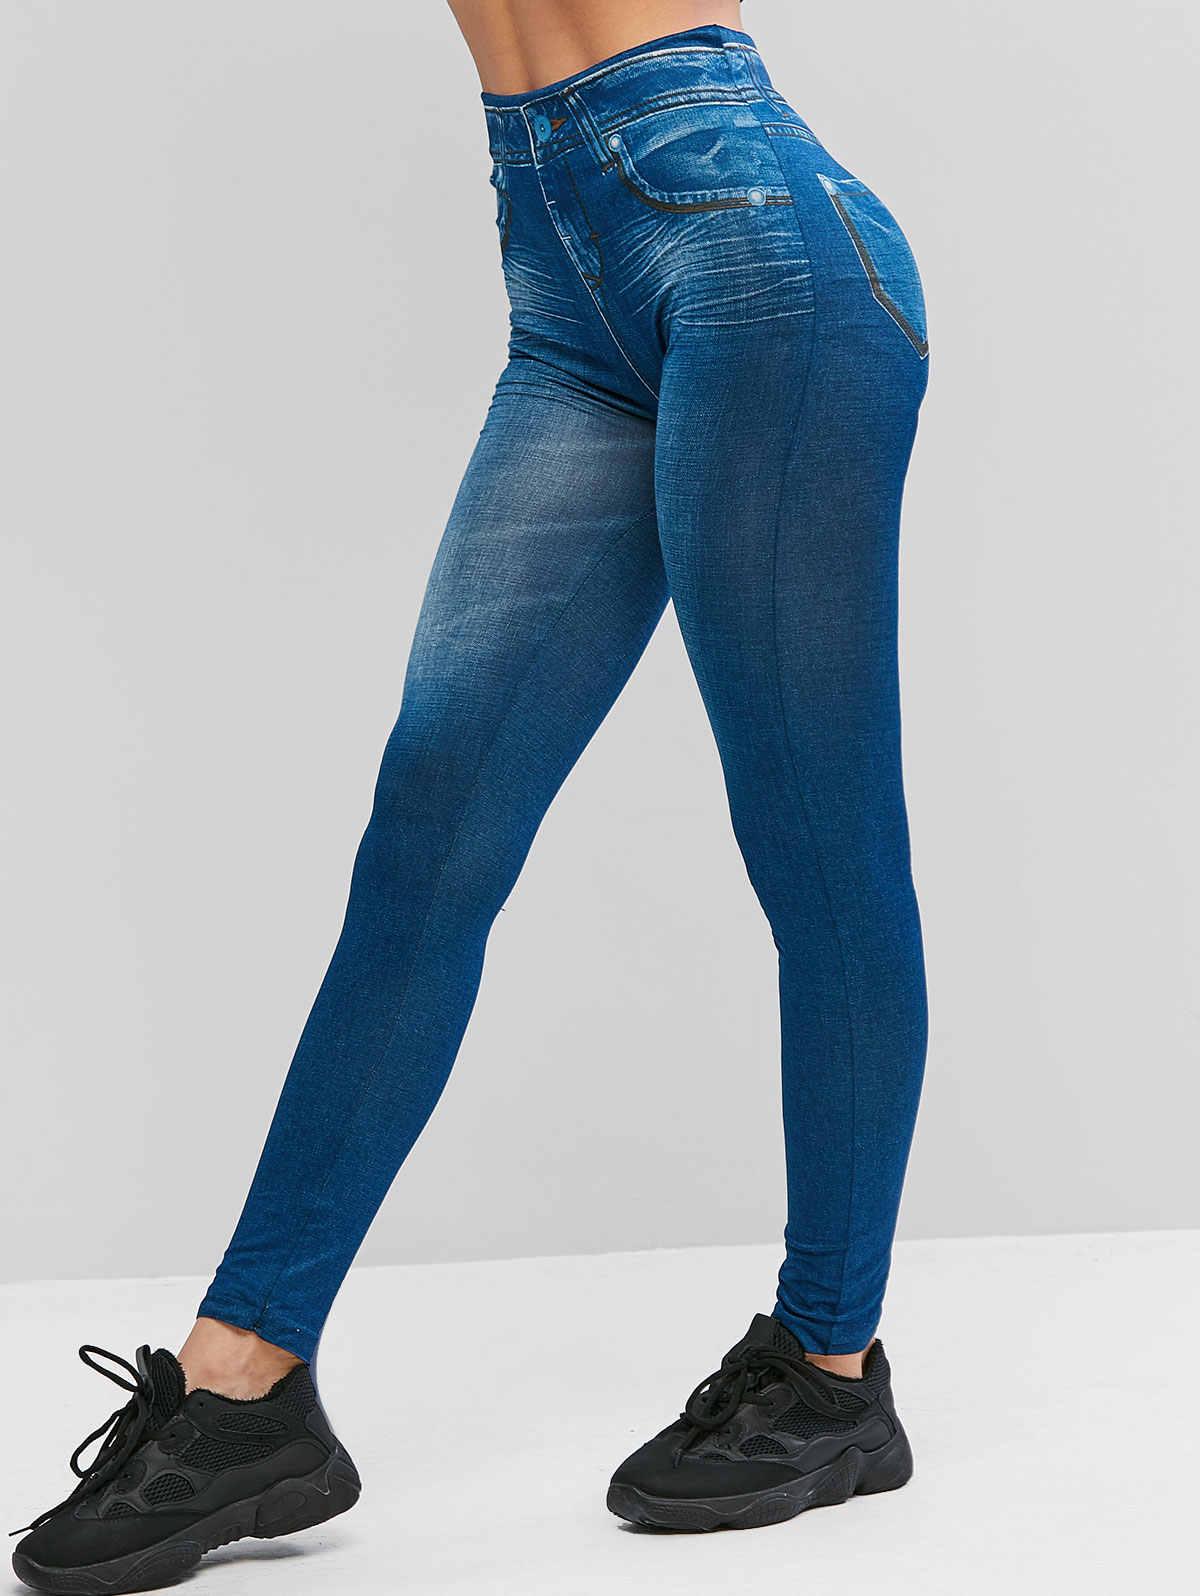 ZAFUL Denim Leggings Vrouwen Broek Elastische Hoge Taille Afdrukken Leggings 2019 Herfst Broek Jumper Streetwear Lange Jeggings Femme